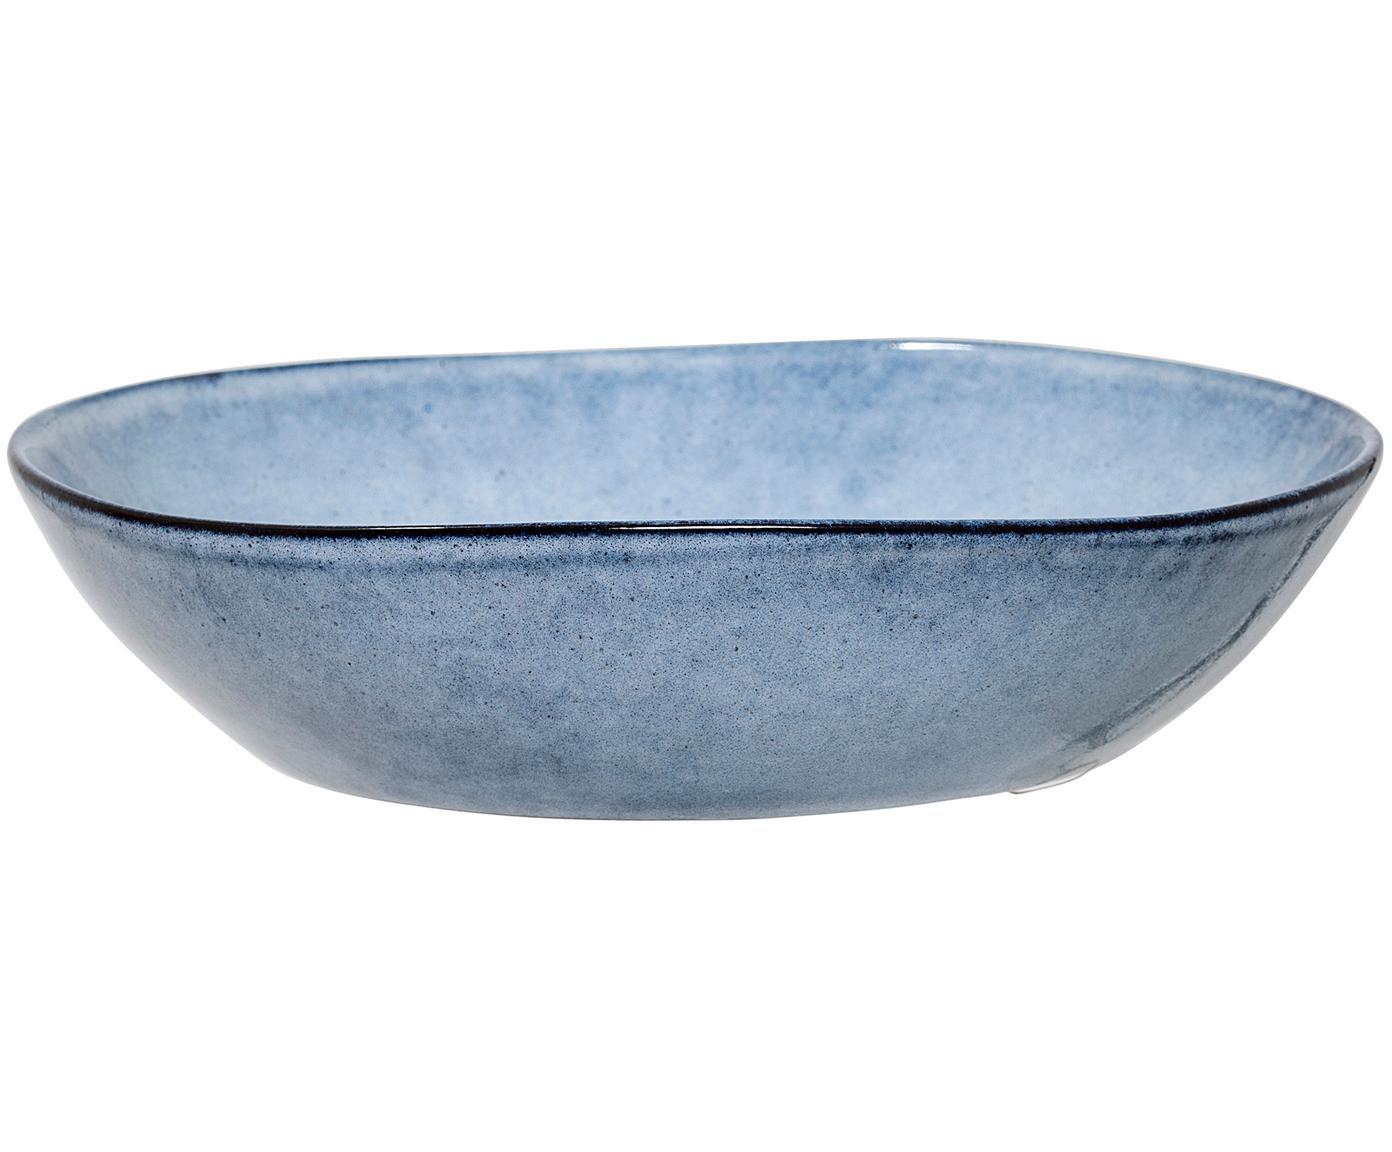 Handgemaaakt soepbord Sandrine, Keramiek, Blauw, Ø 22 x H 5 cm